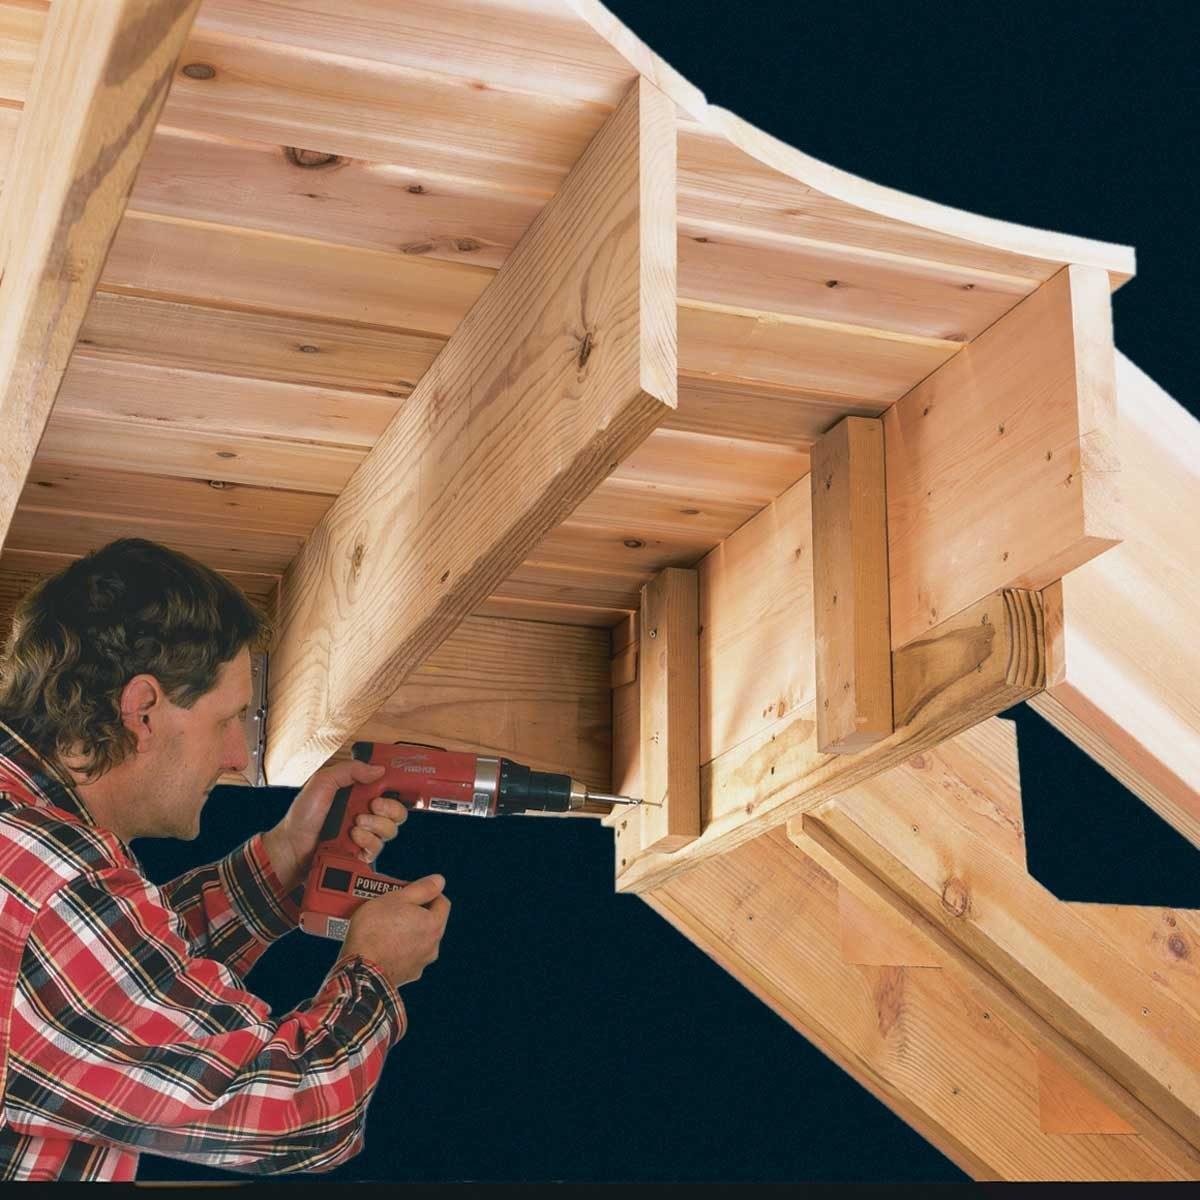 How To Build Deck Stairs The Family Handyman | 8 Step Wood Stair Stringer | Cedar Tone | Menards | Deck | Framing Square | Precut Prebuilt